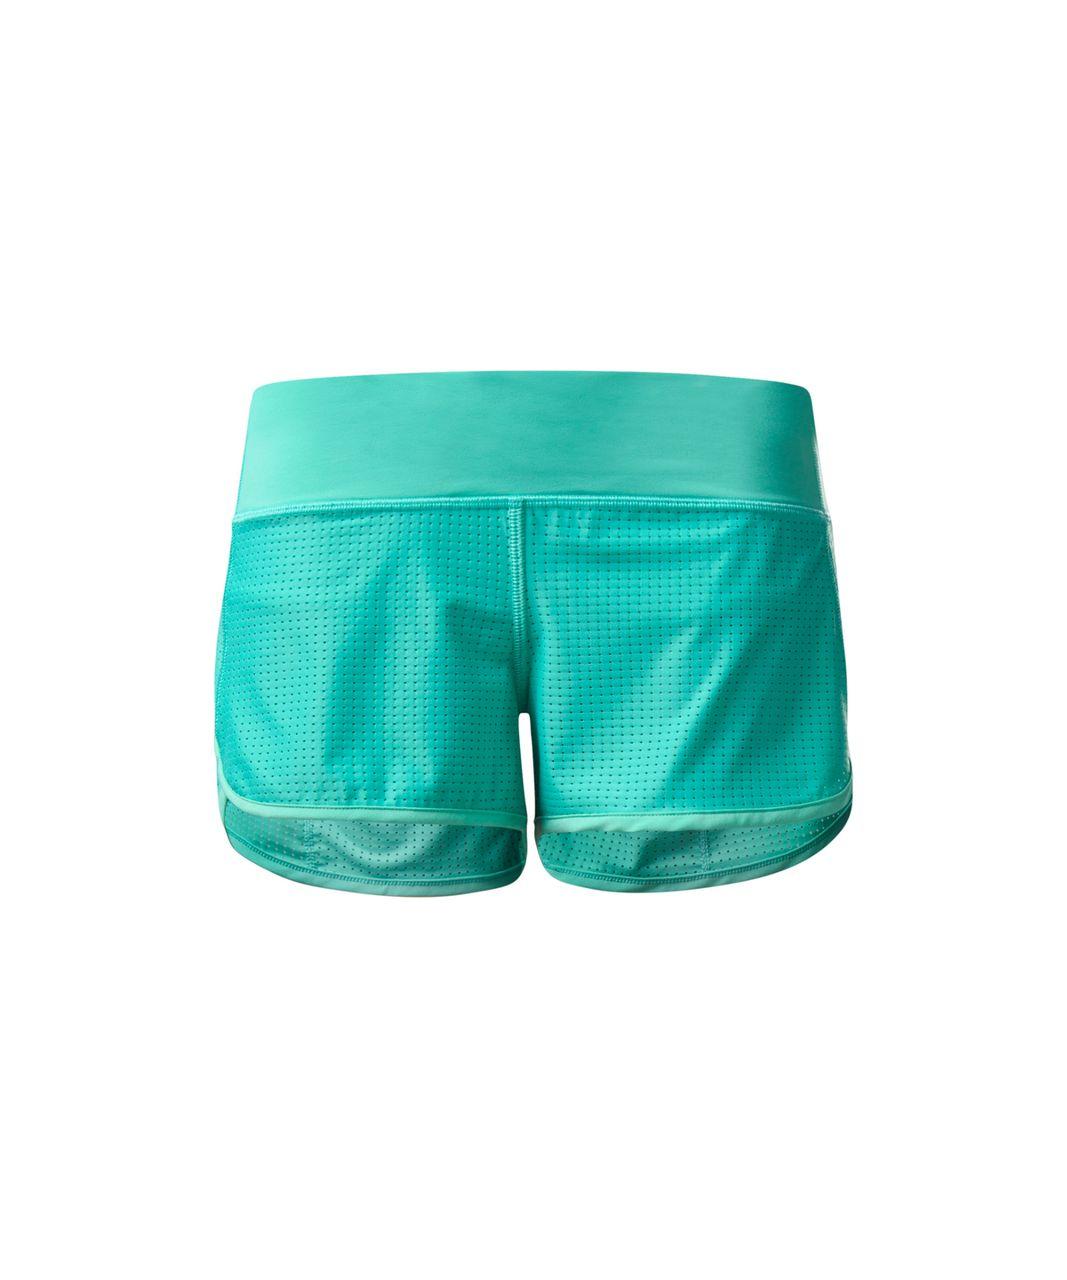 Lululemon Speed Short (Mesh) - Bali Breeze